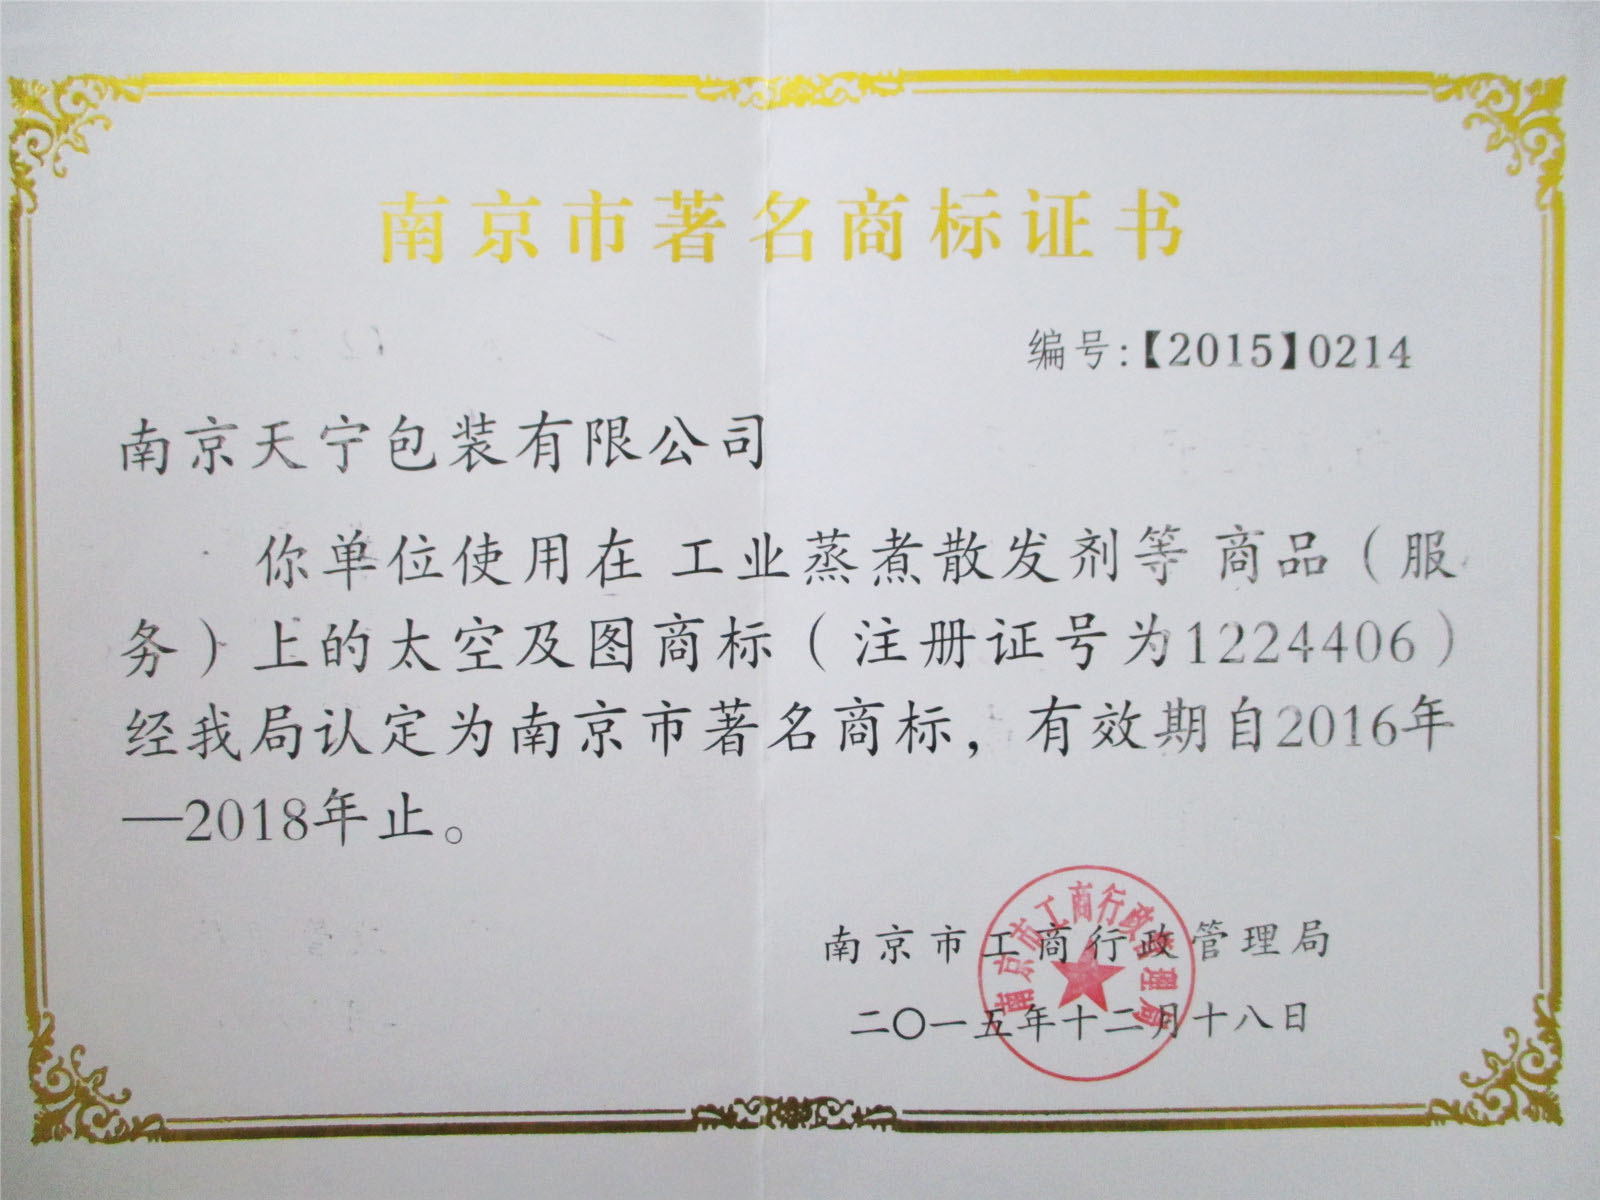 Famous trademark certificate